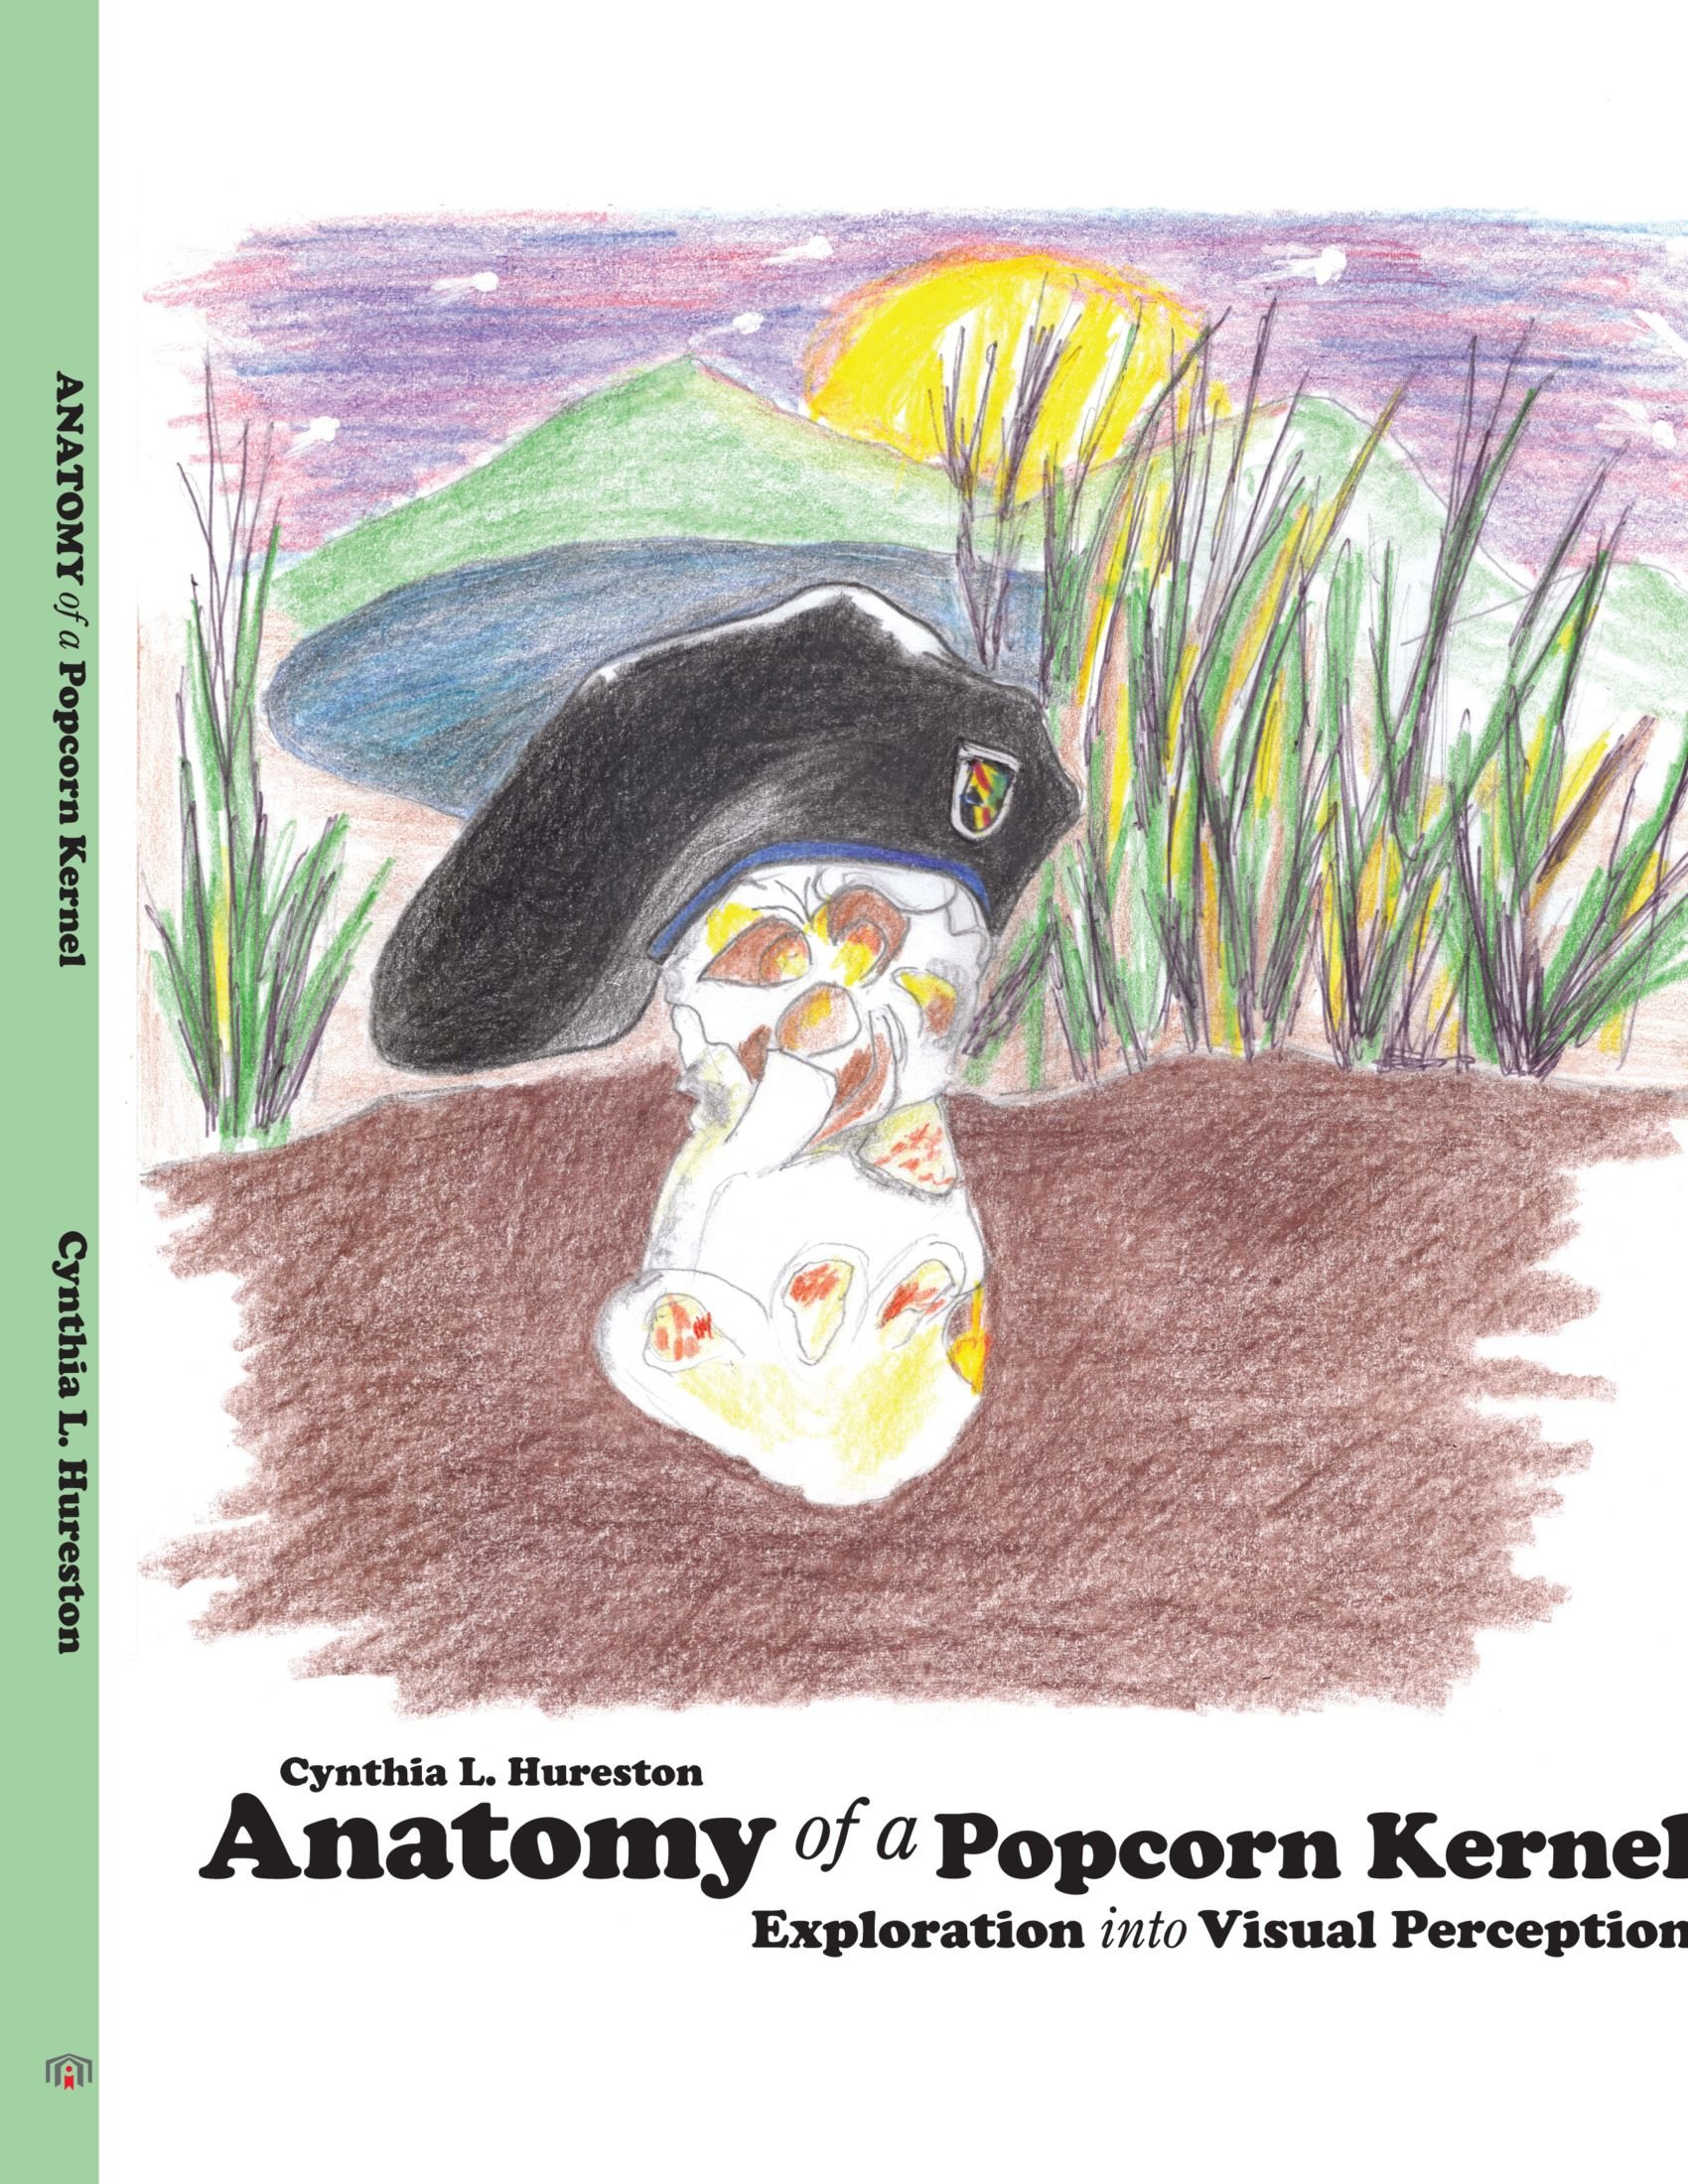 Anatomy of a Popcorn Kernel: Exploration into Visual Perception ...